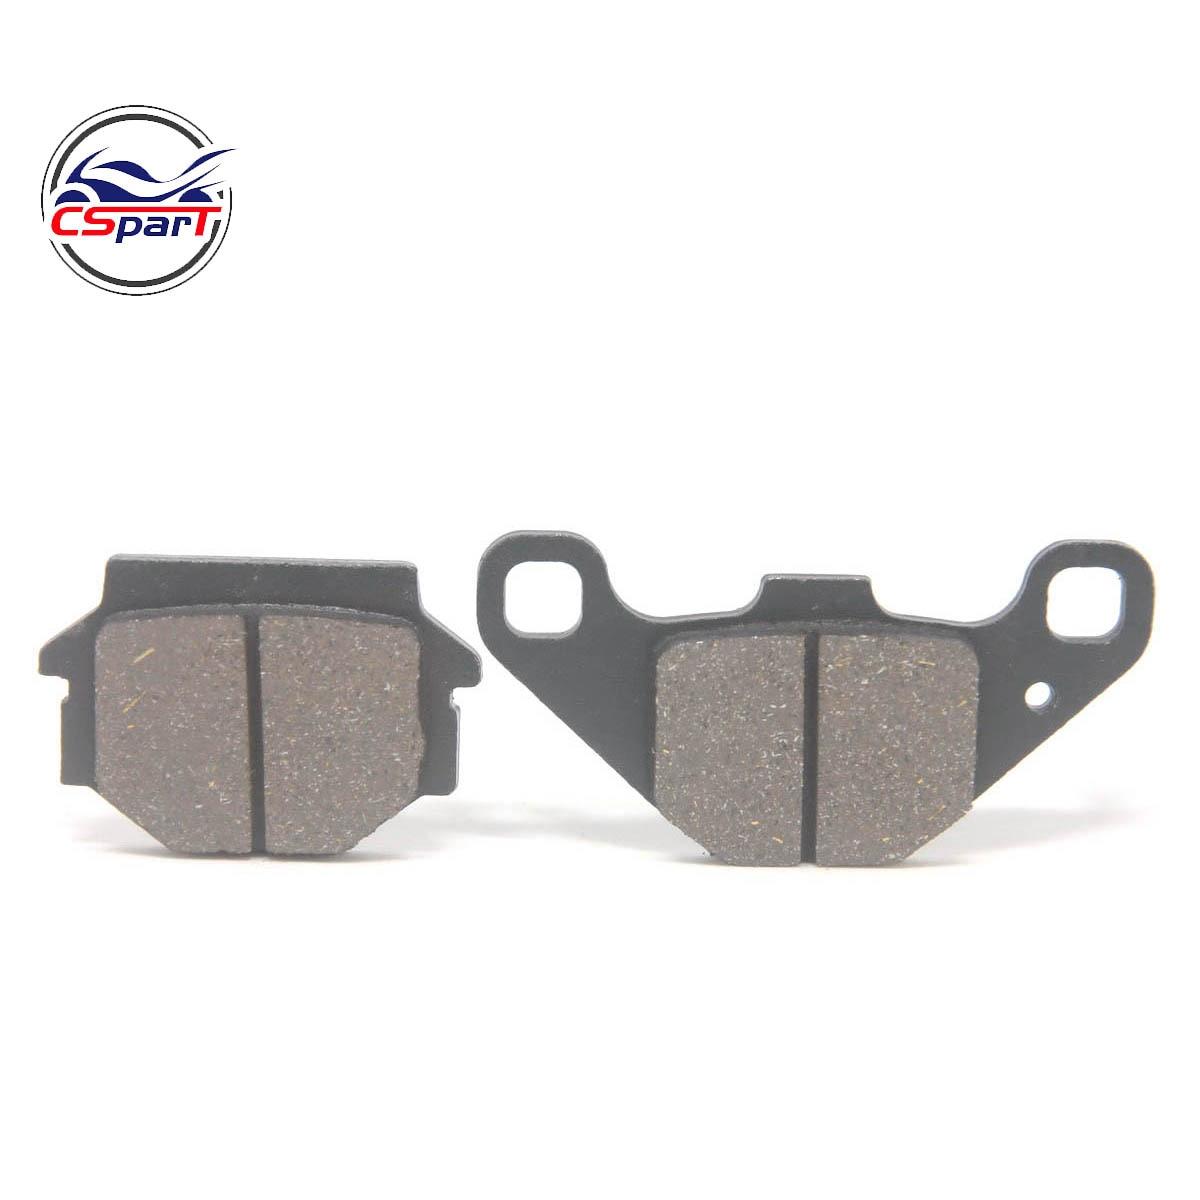 1 Pair Rear Brake Pad For CFmoto CF500 UFORCE 500 550 800 500CC 800CC U5 U8 UFORCE UTV 7030-081520 7030-0855A0